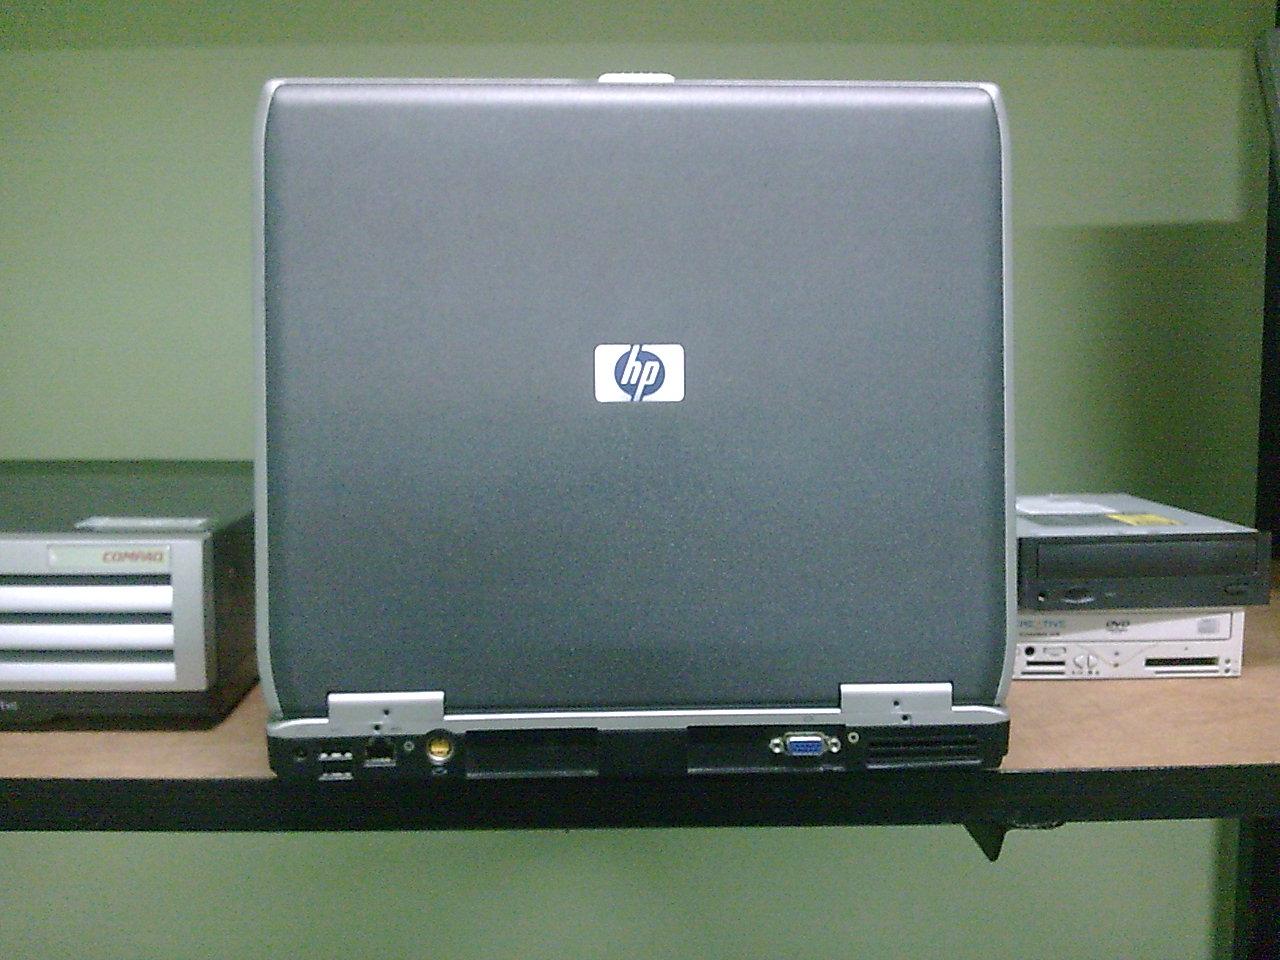 Laptop terpakai untuk dijual selangor